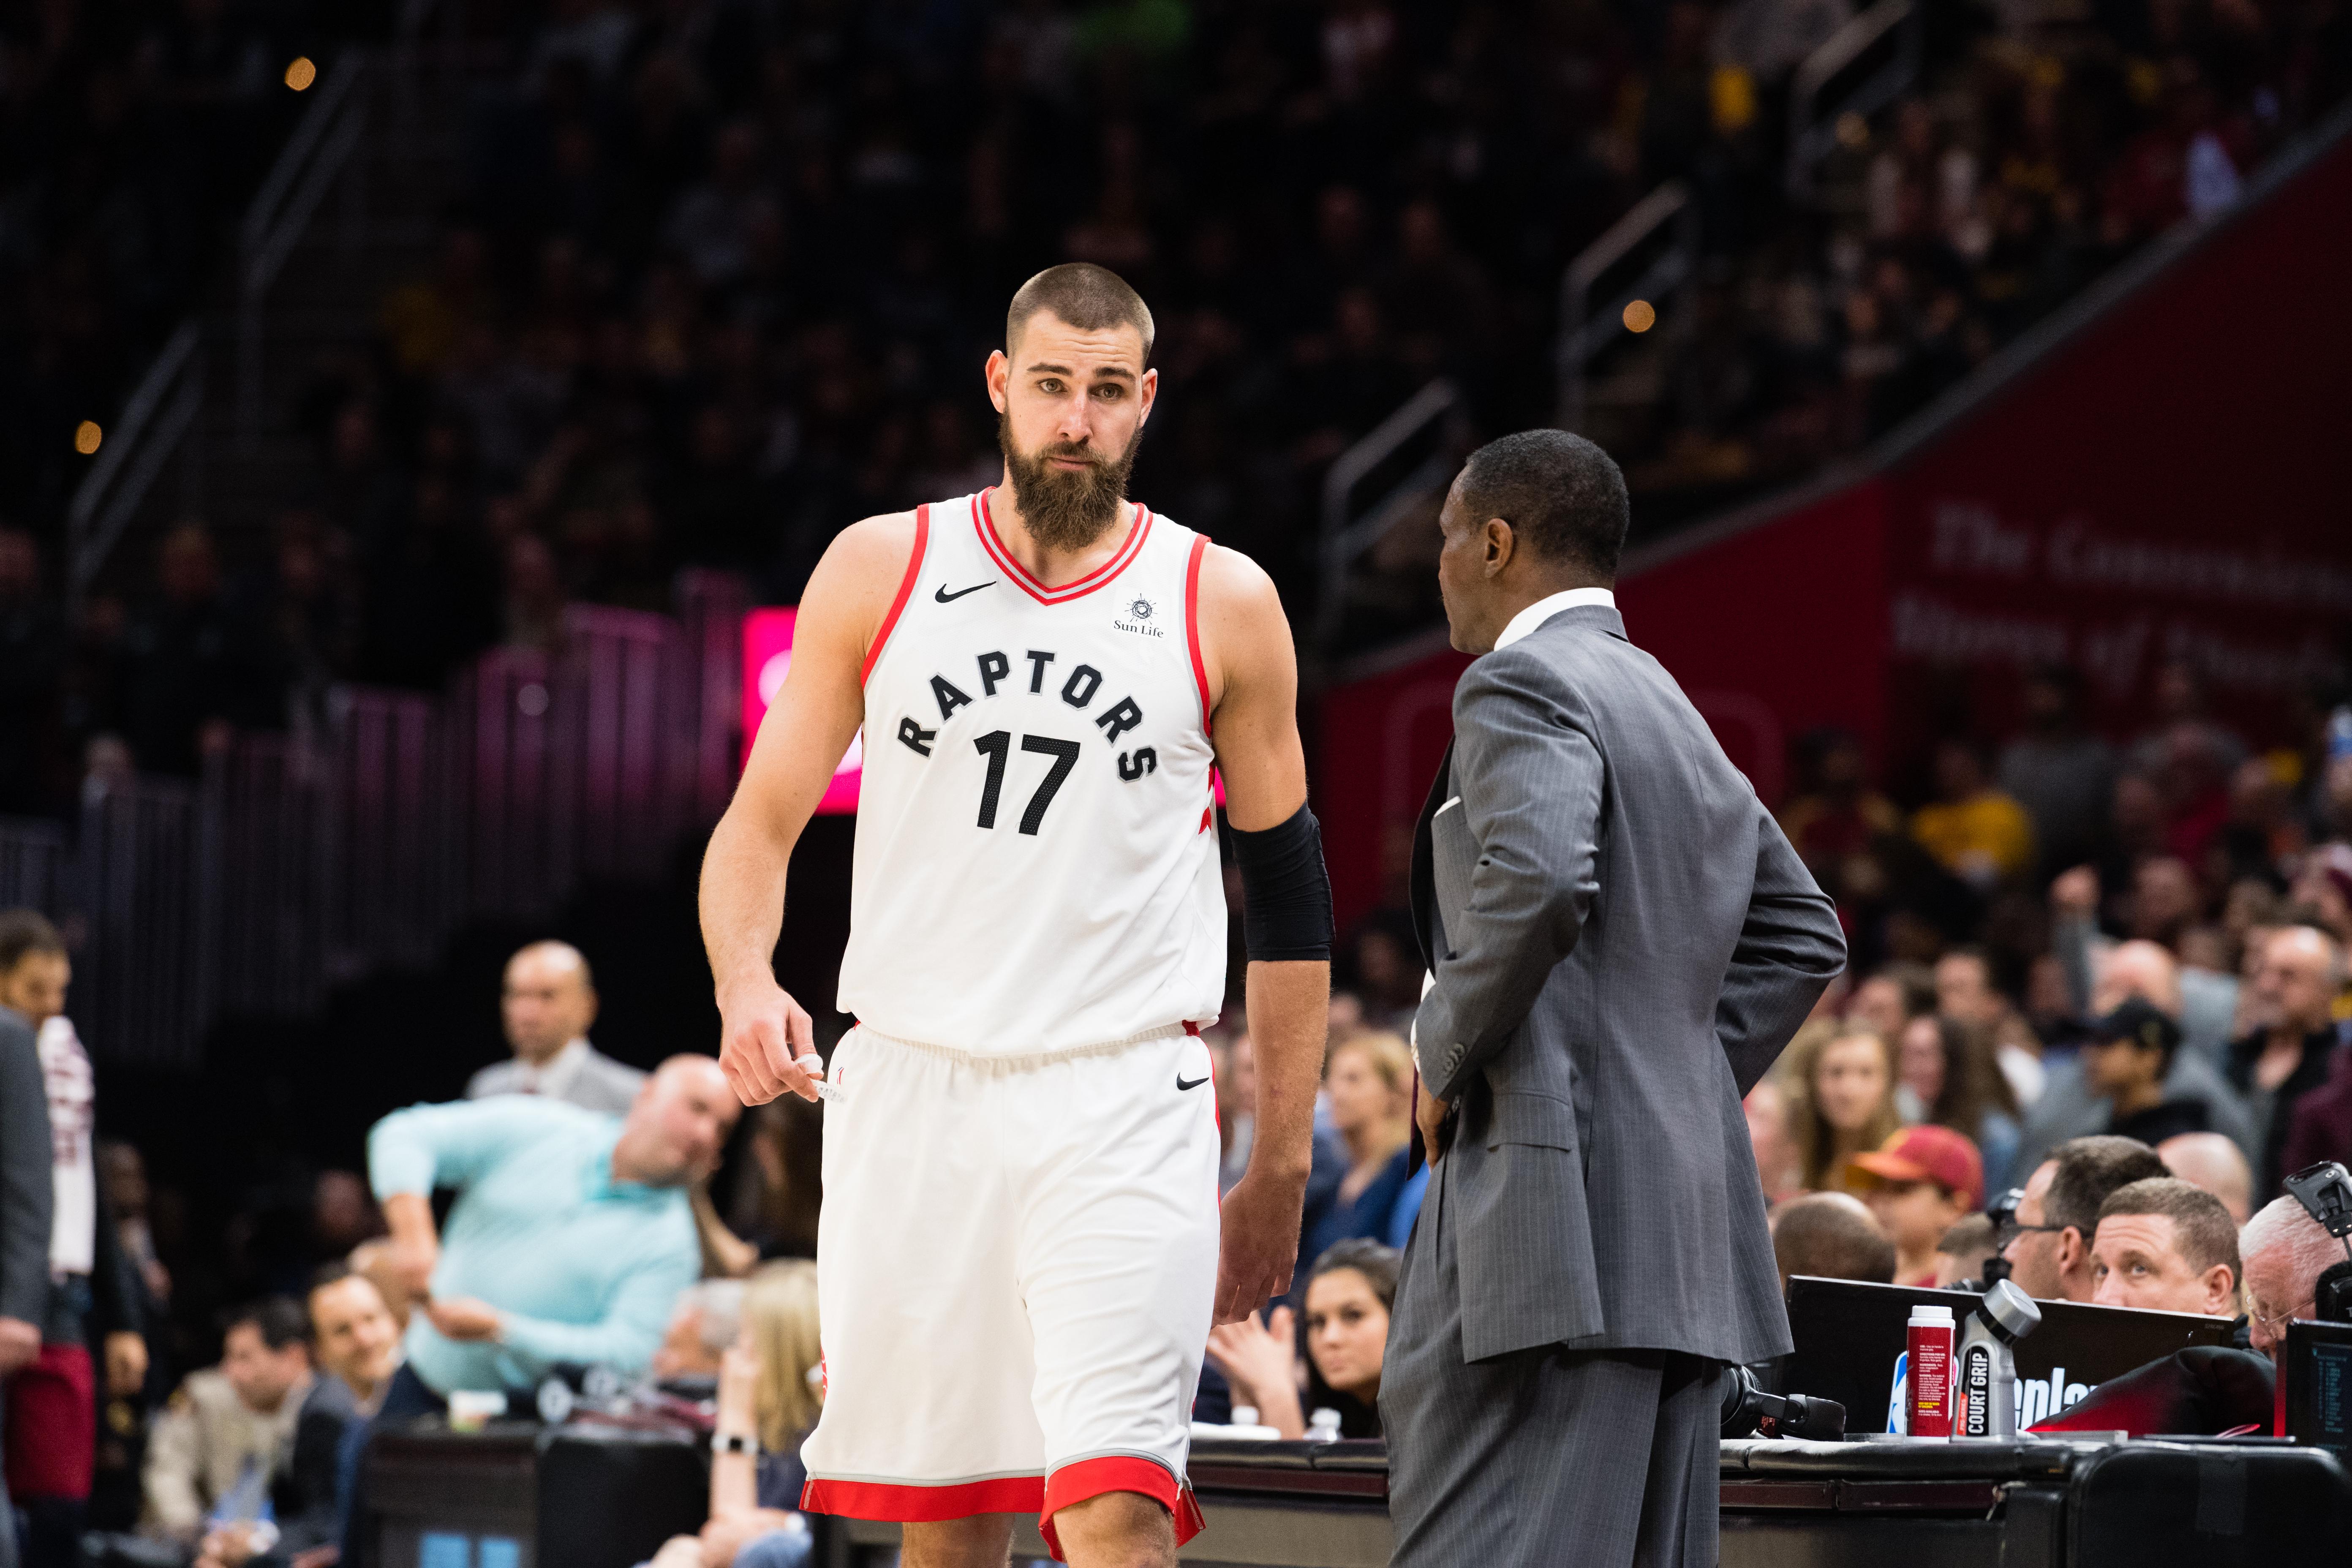 Bench comes up big as Toronto Raptors edge Denver Nuggets 114-110